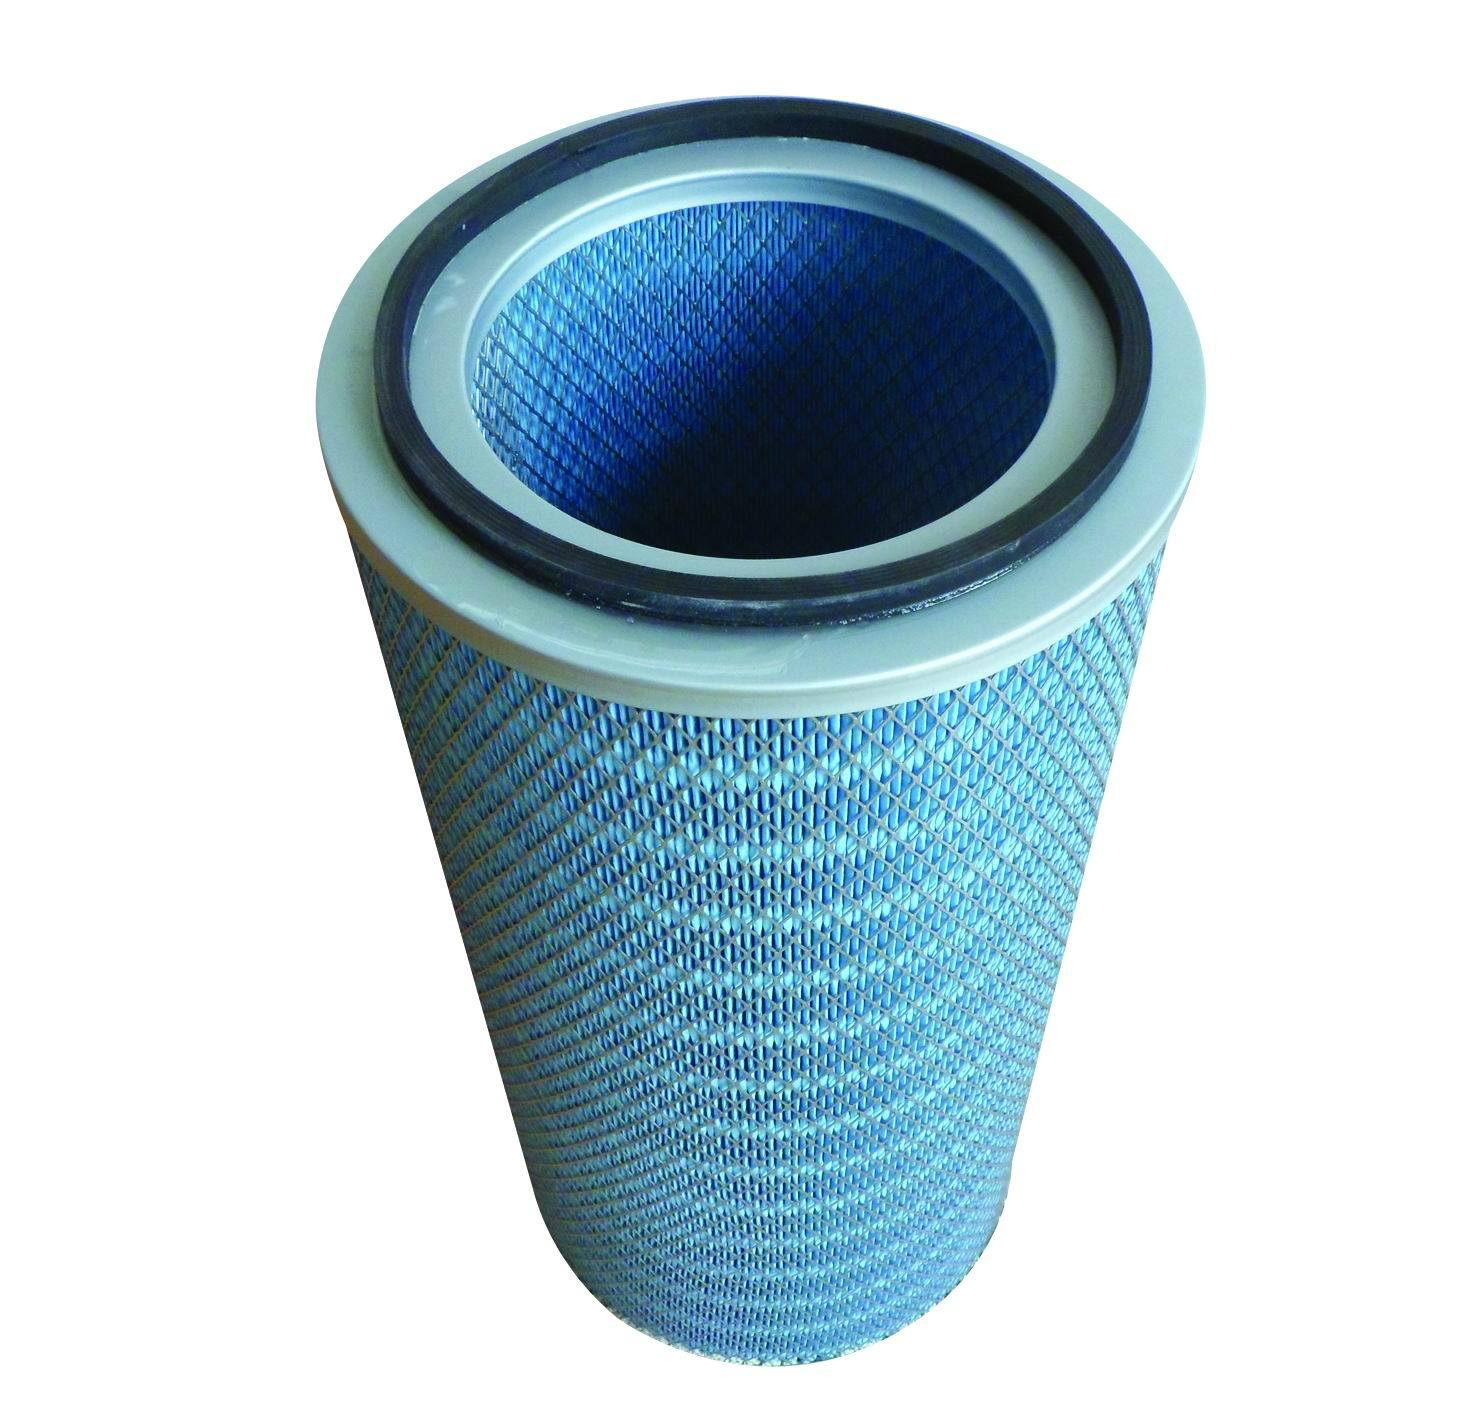 Welder Air Filter : Welding fume air filter cartridge photos pictures